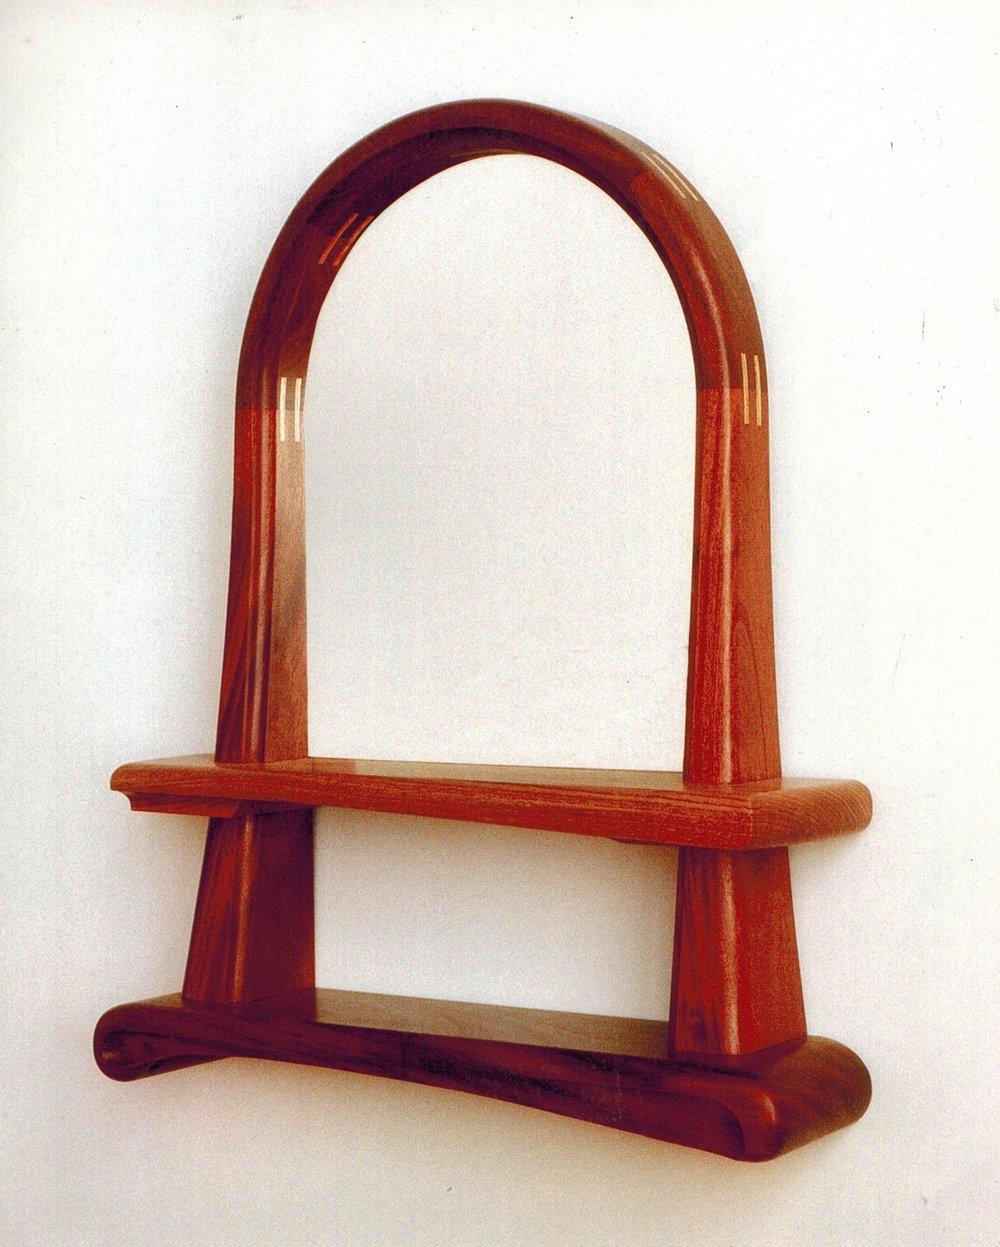 Two-shelf mirror, mahogany & oak.